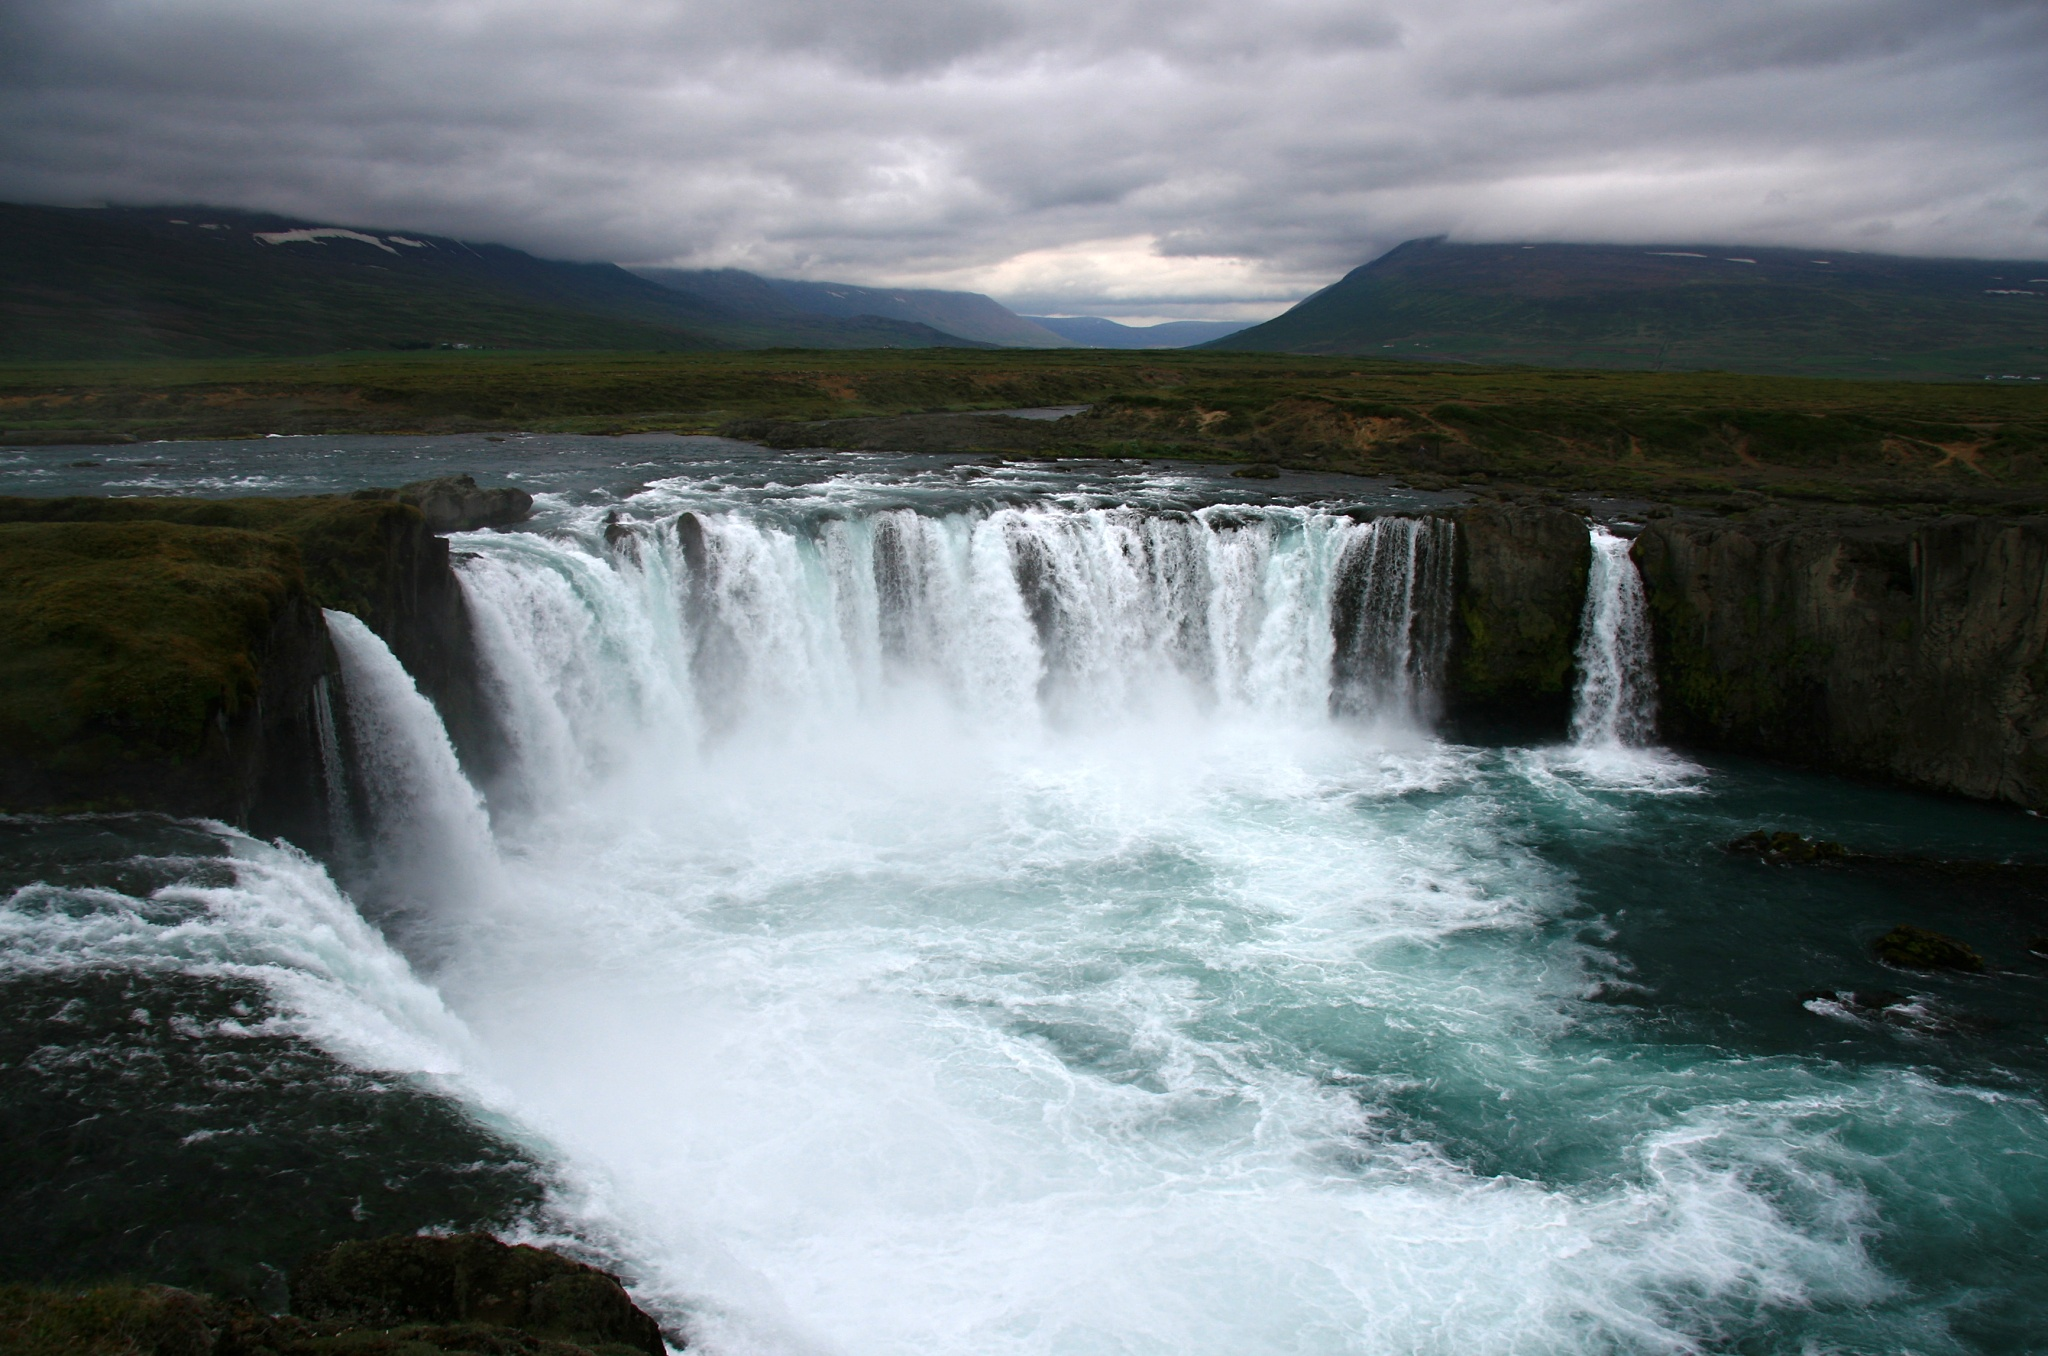 Mohutný vodopád Goðafoss